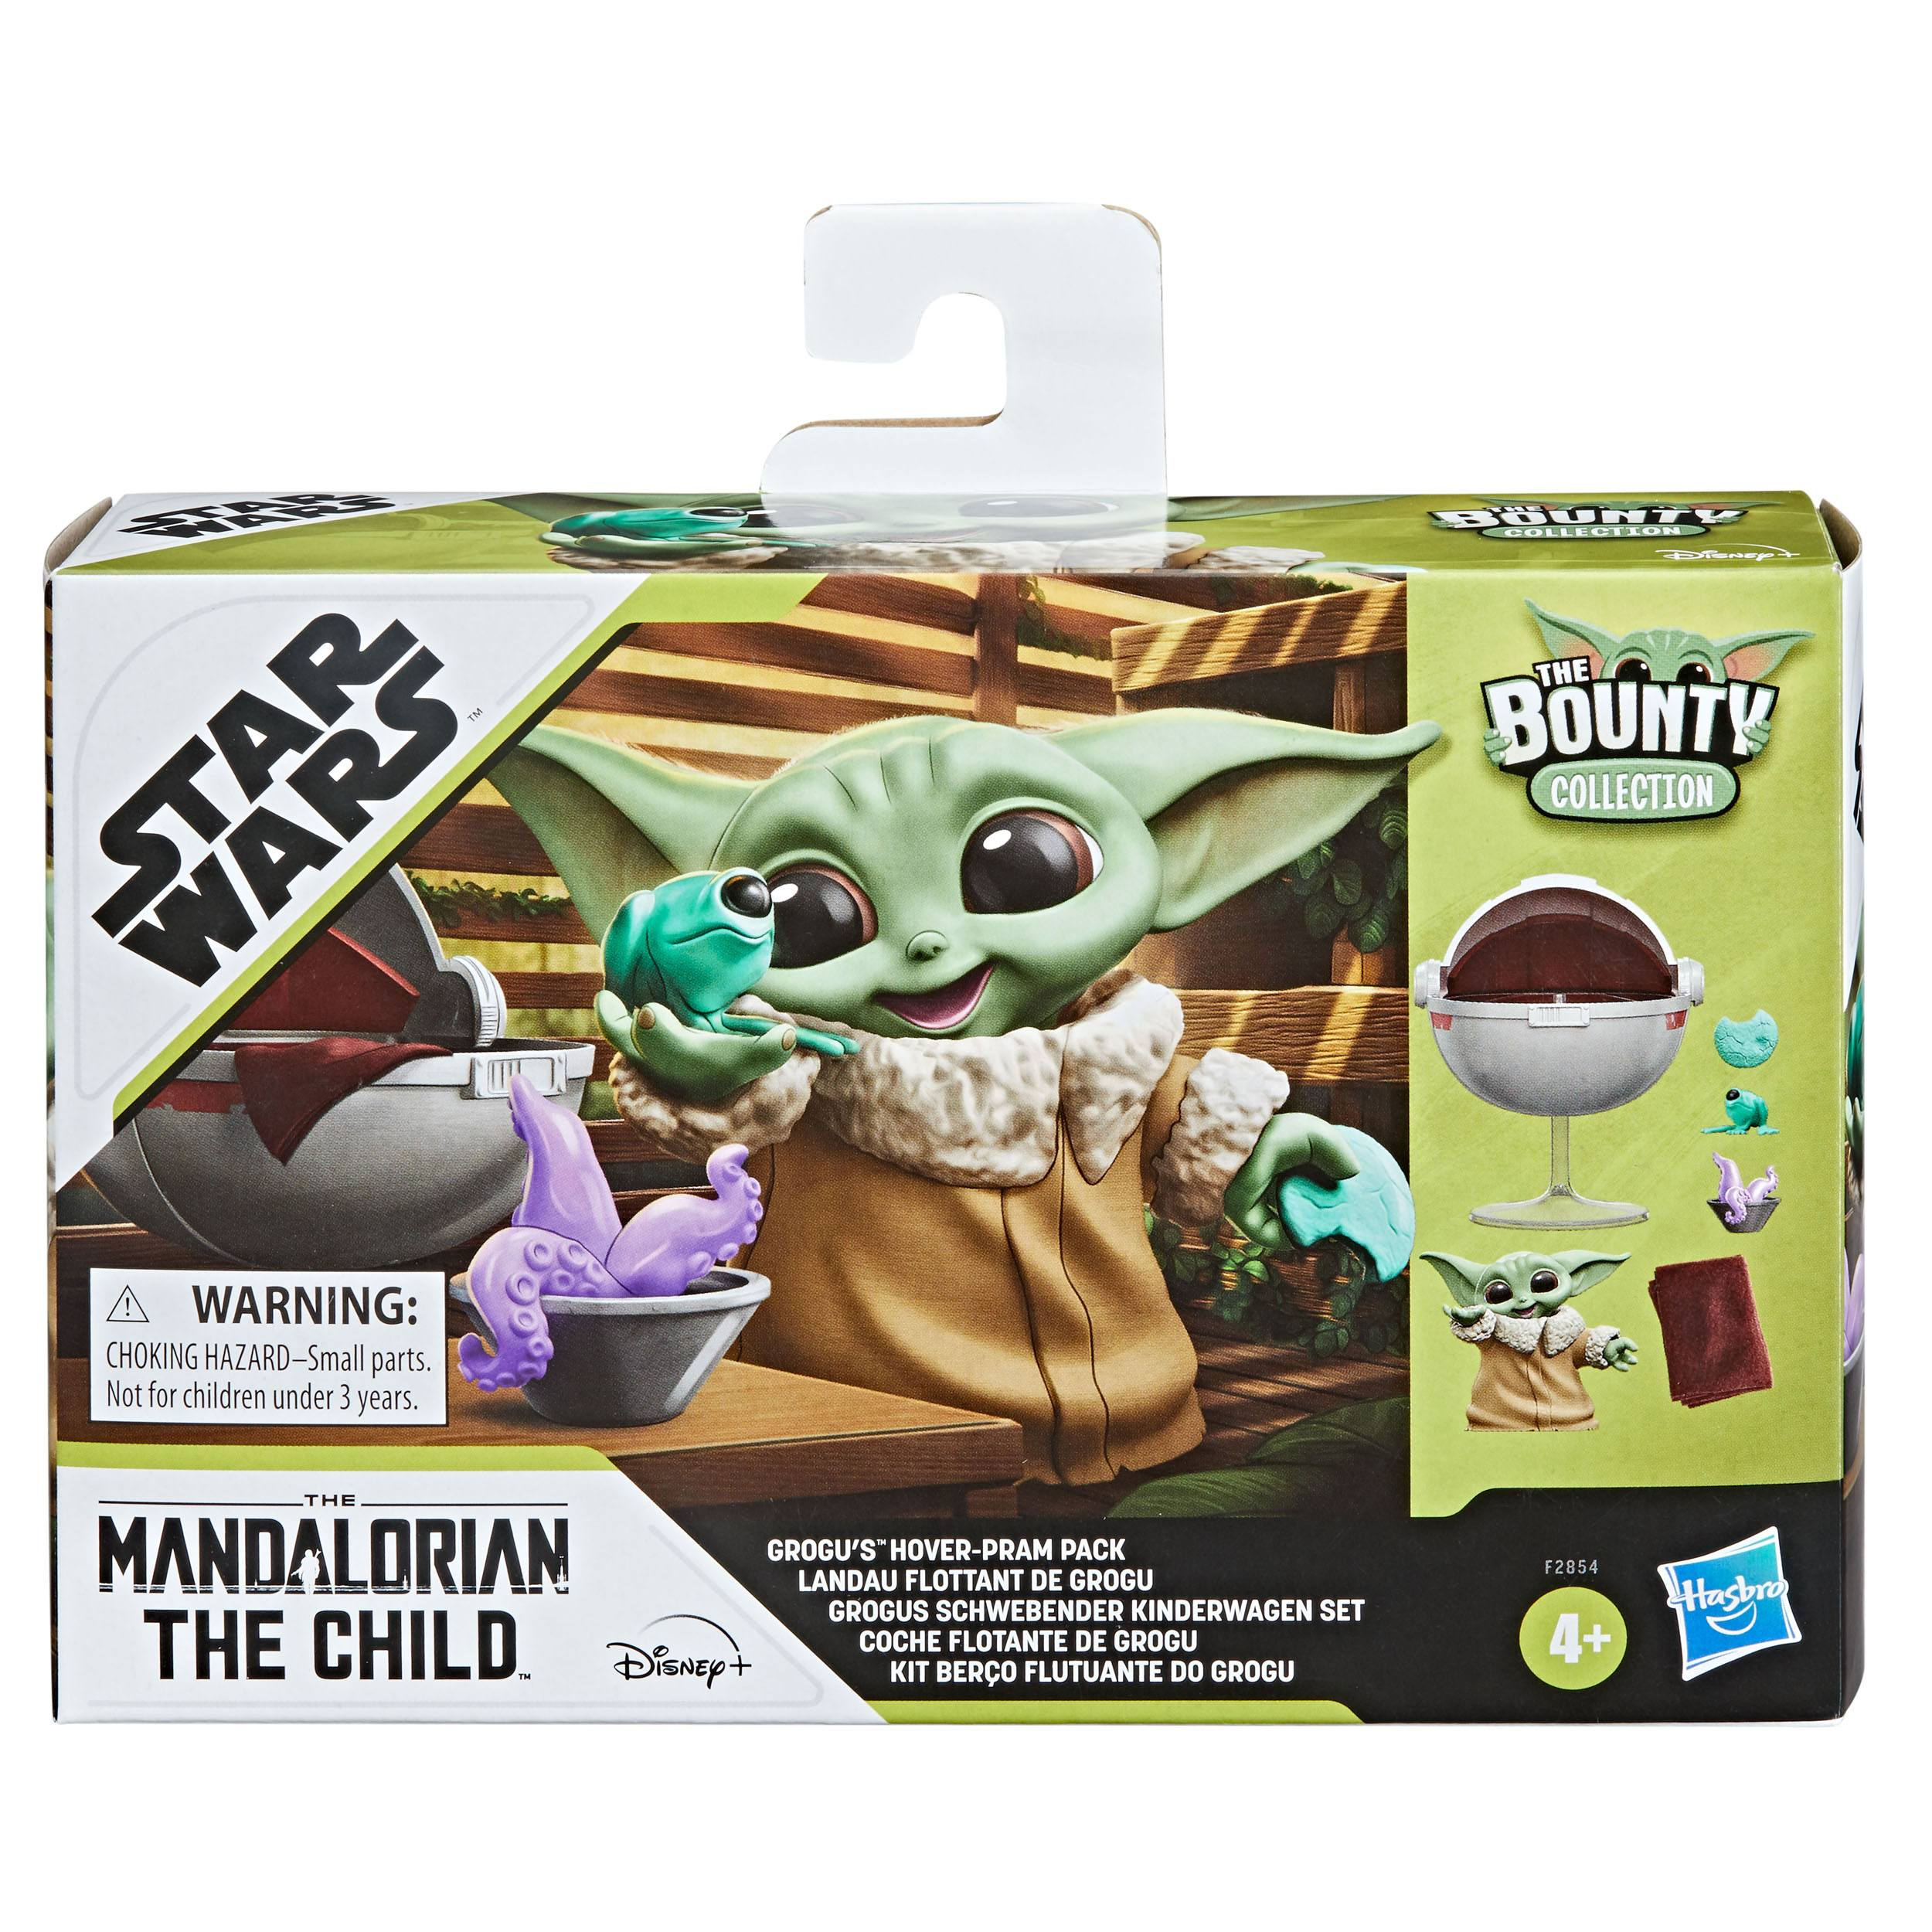 Star Wars Mandalorian Bounty Collection Pack Grogus schwebender Kinderwagen HASF2854 5010993889075